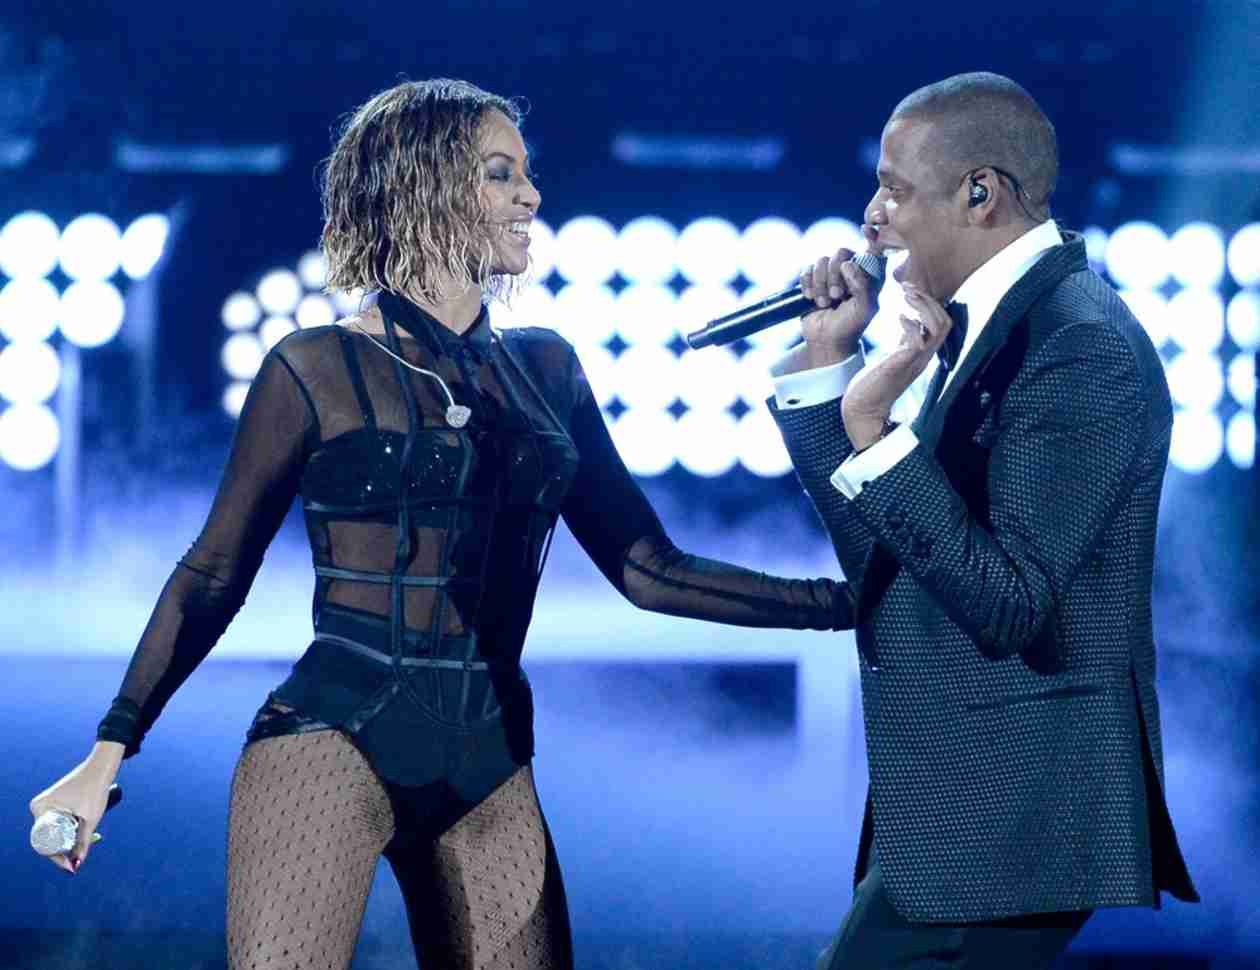 Beyoncé Shares Adorable New Photo of Daughter Blue Ivy